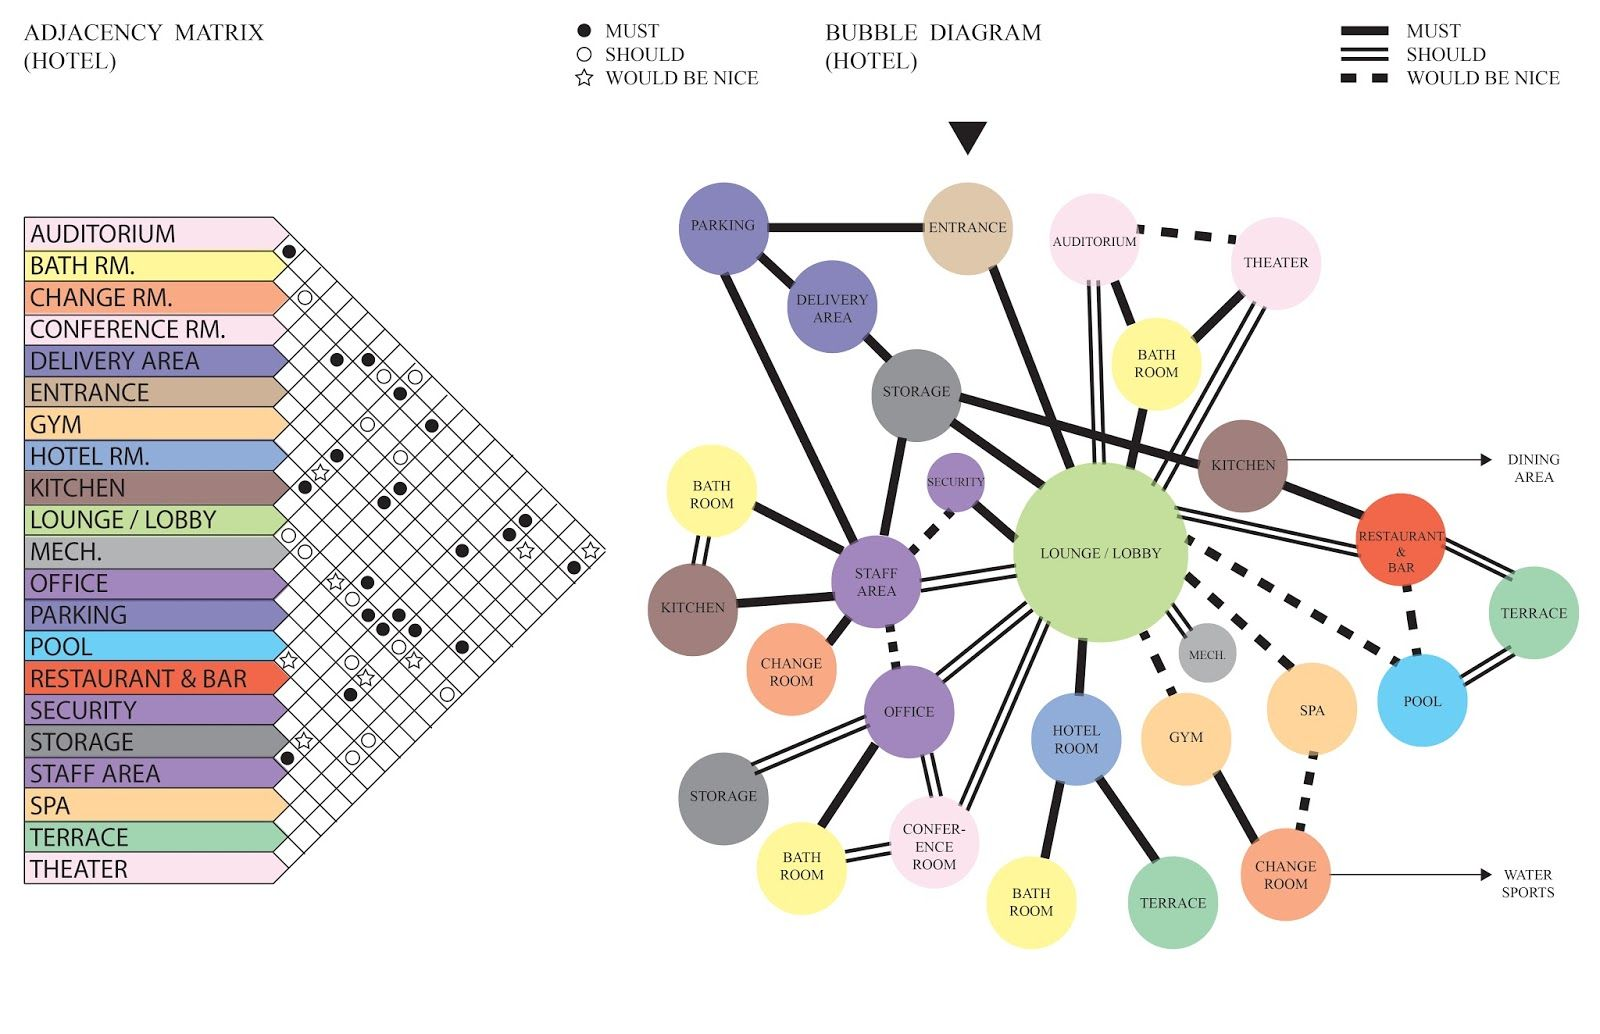 hotel architecture architecture program architecture design bubble diagram architecture architecture concept diagram [ 1600 x 1034 Pixel ]